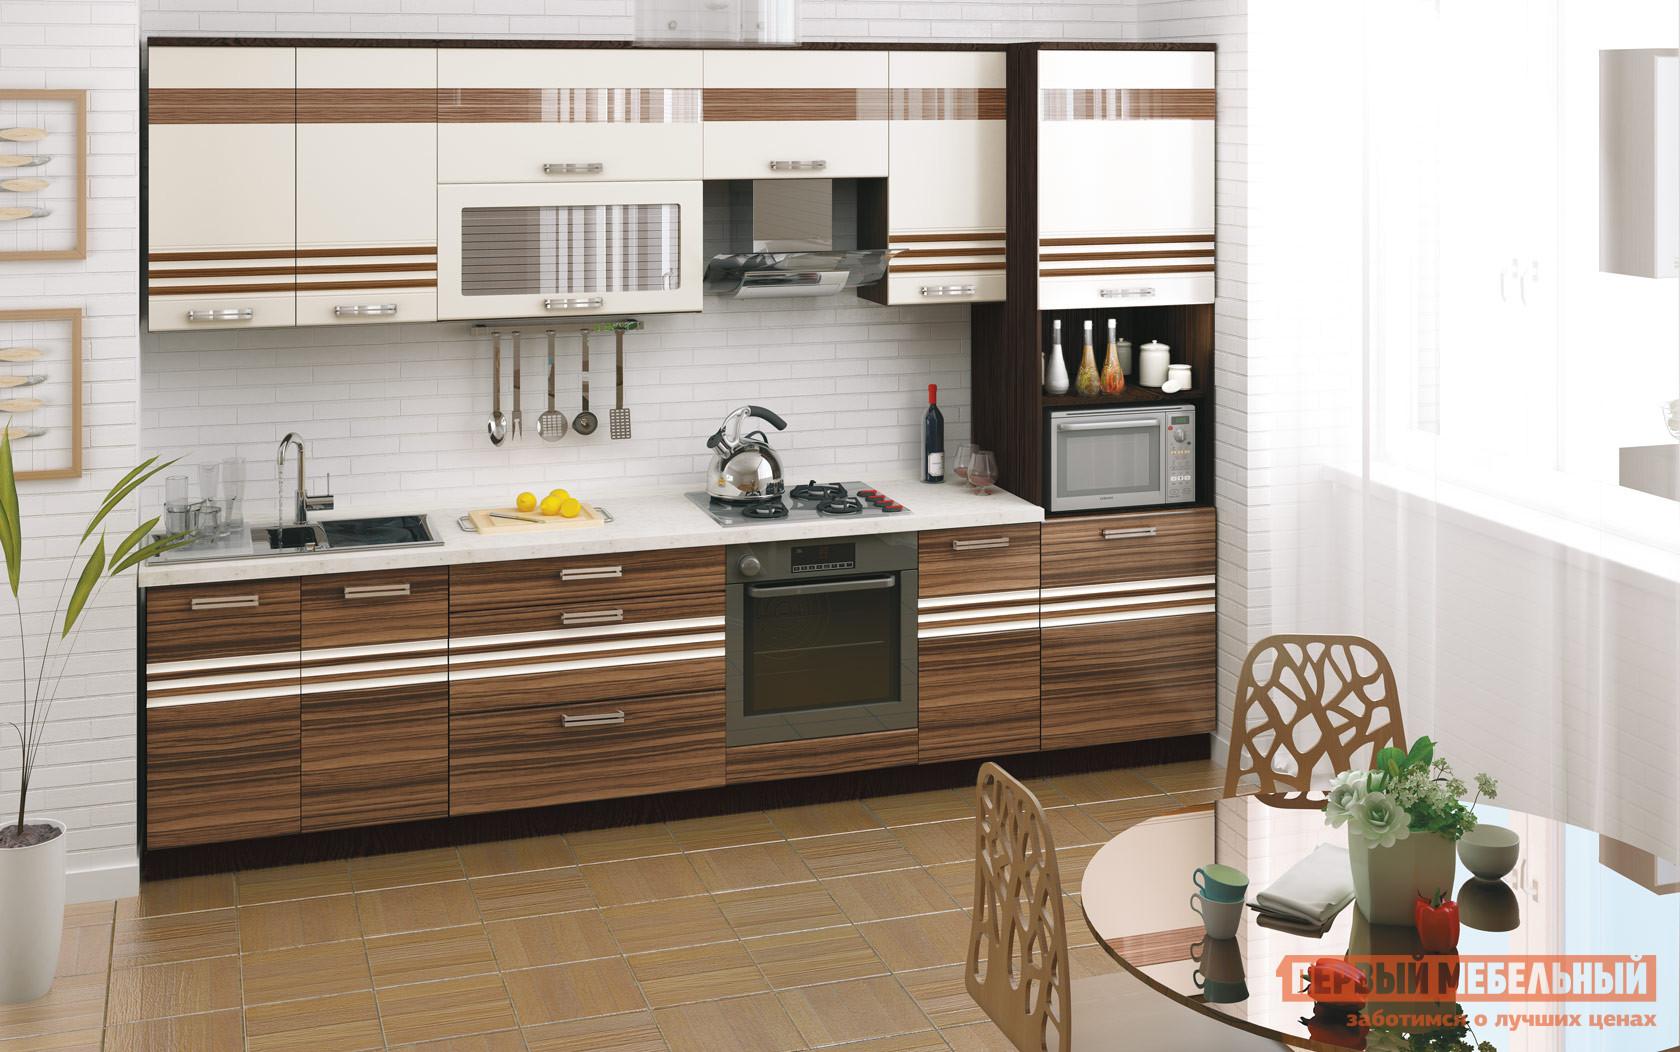 Кухонный гарнитур Витра Рио 320 кухонный гарнитур витра глория 3 к1